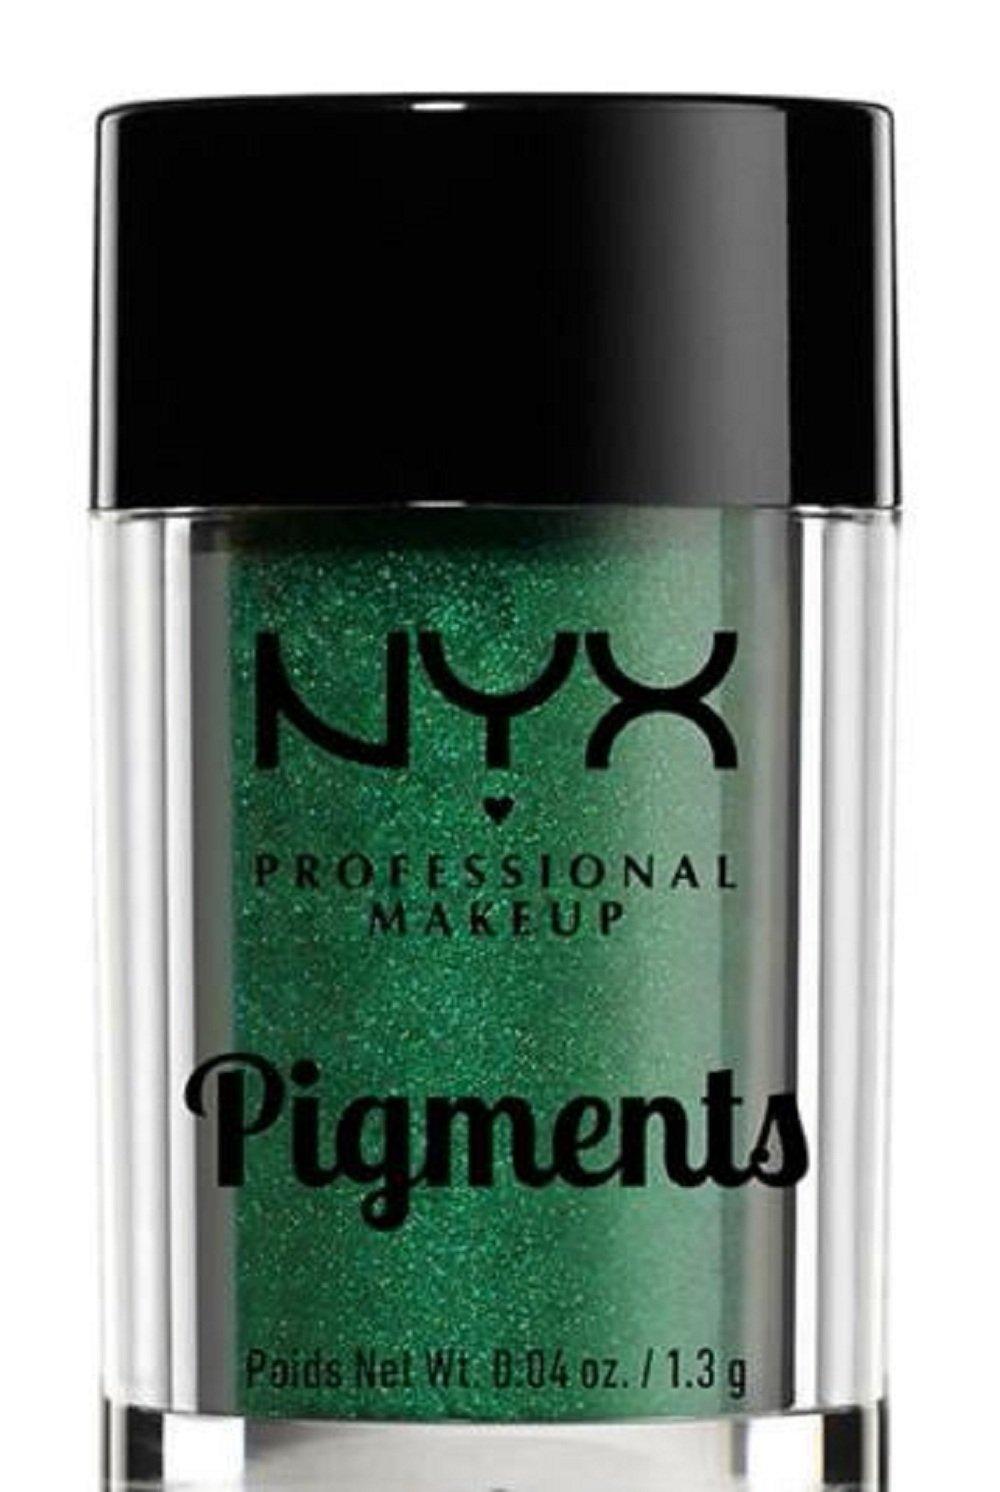 Exclusive Makeup Shimmer Eyeshadow Pigments - NYX Professional, Trending, Best Selling (KRYPTONITE)